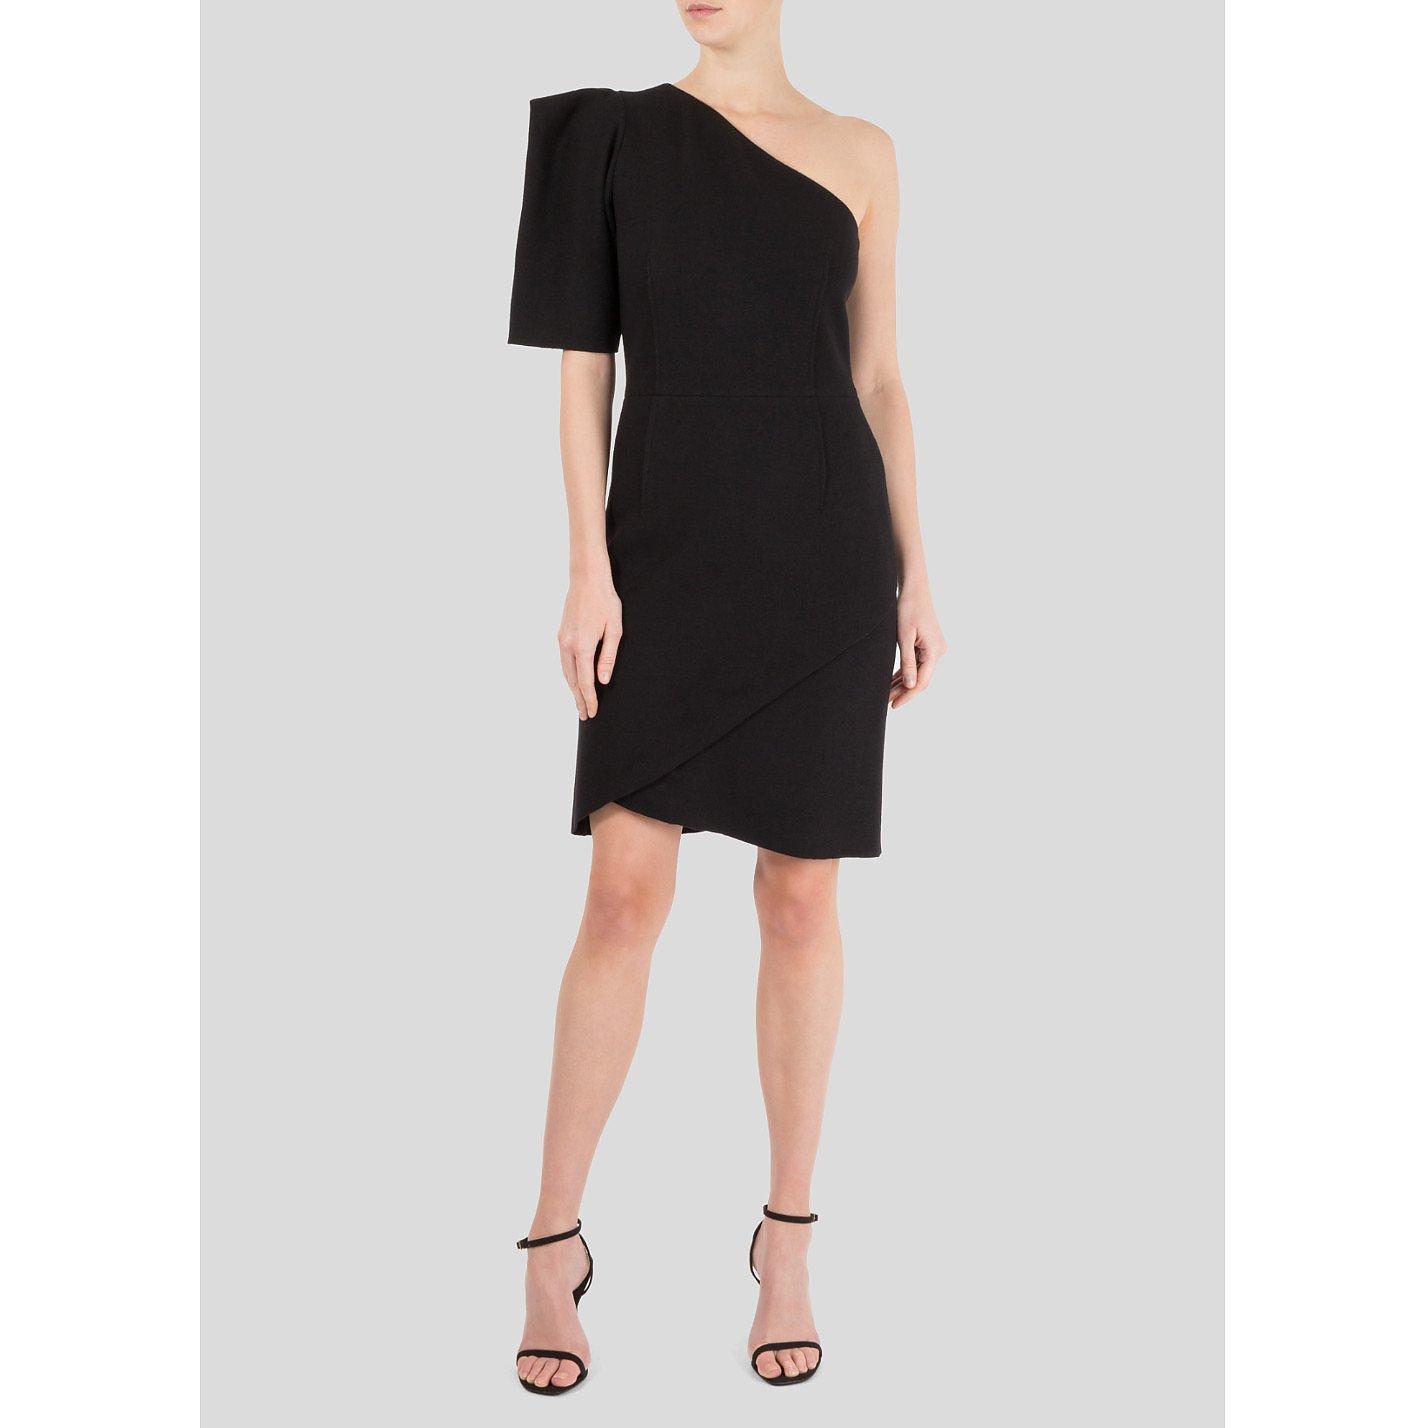 Michael Kors One Shoulder Wool Dress